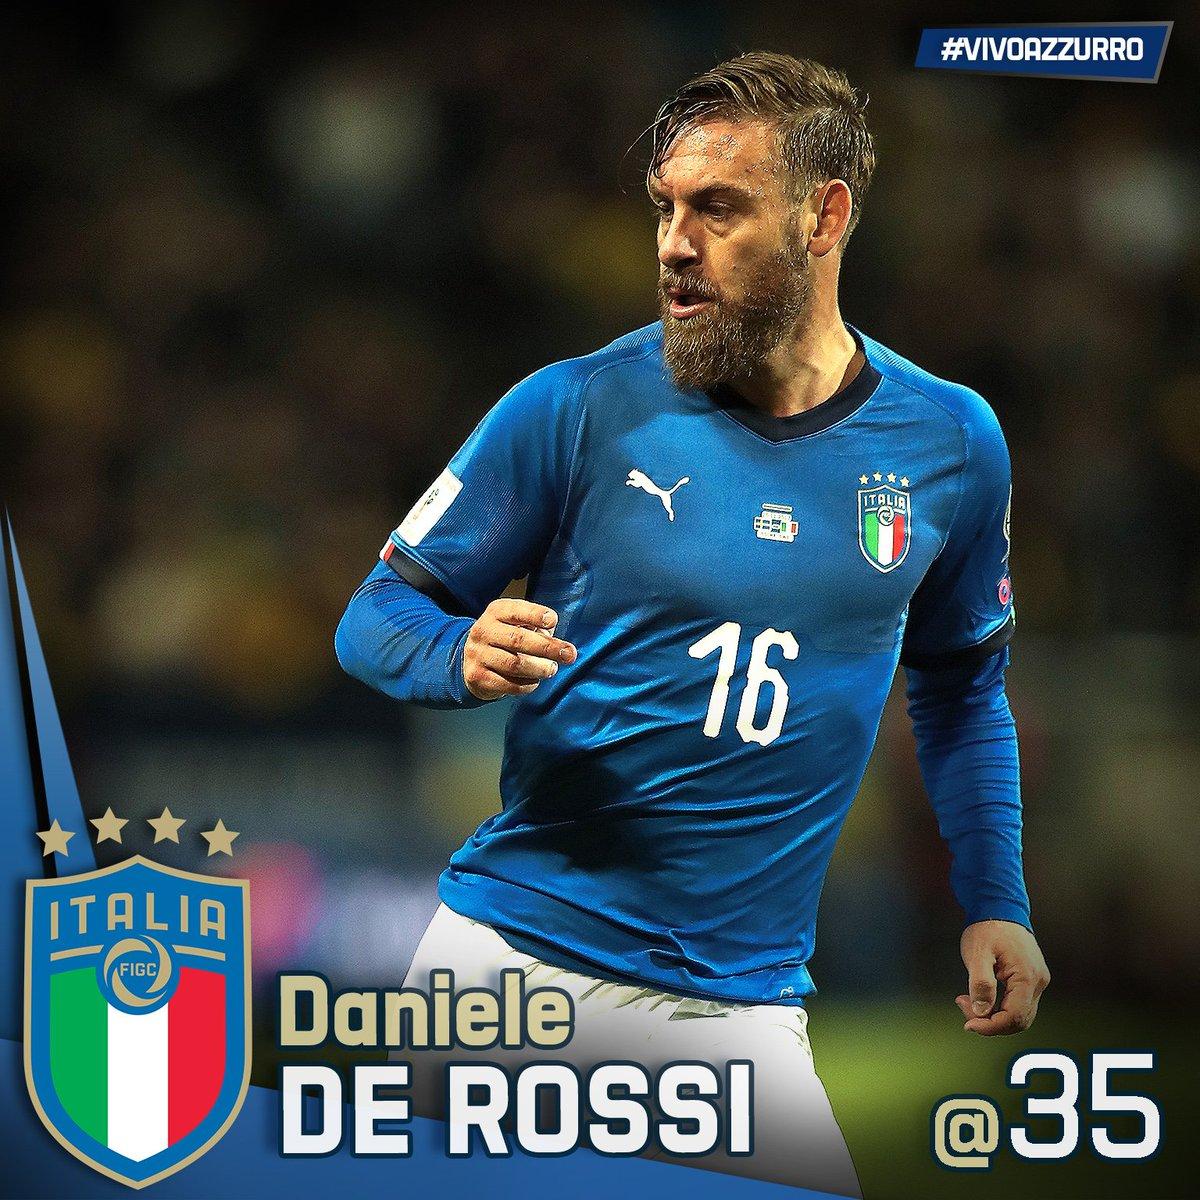 selamat ulang tahun Daniele De Rossi!